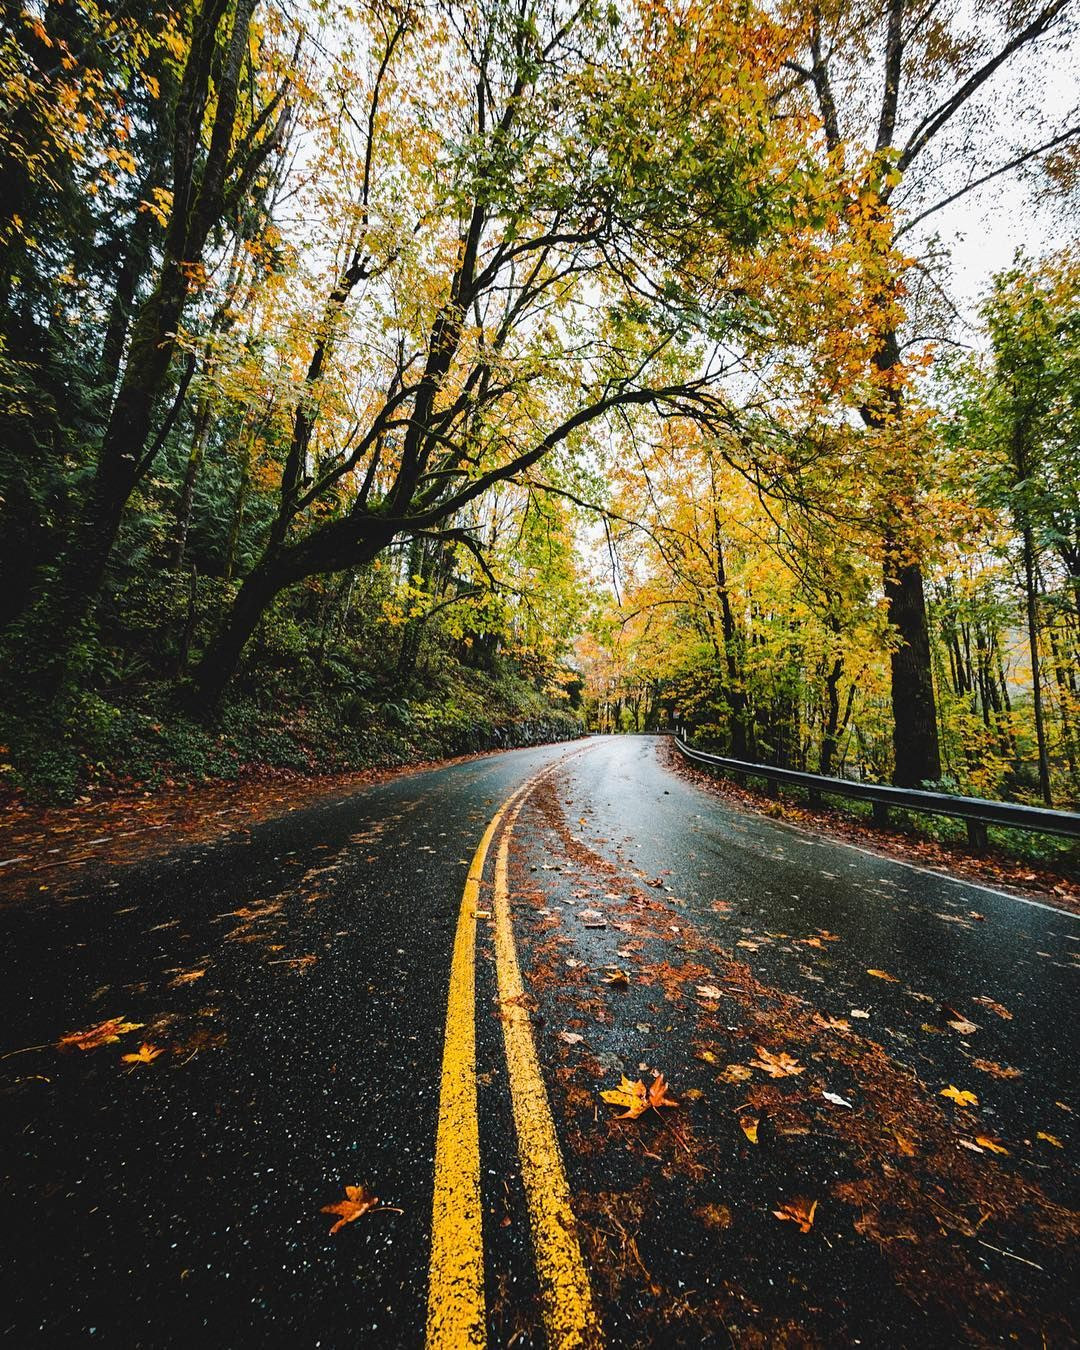 Rainy Autumn Road (Seattle, Washington) By Seattle